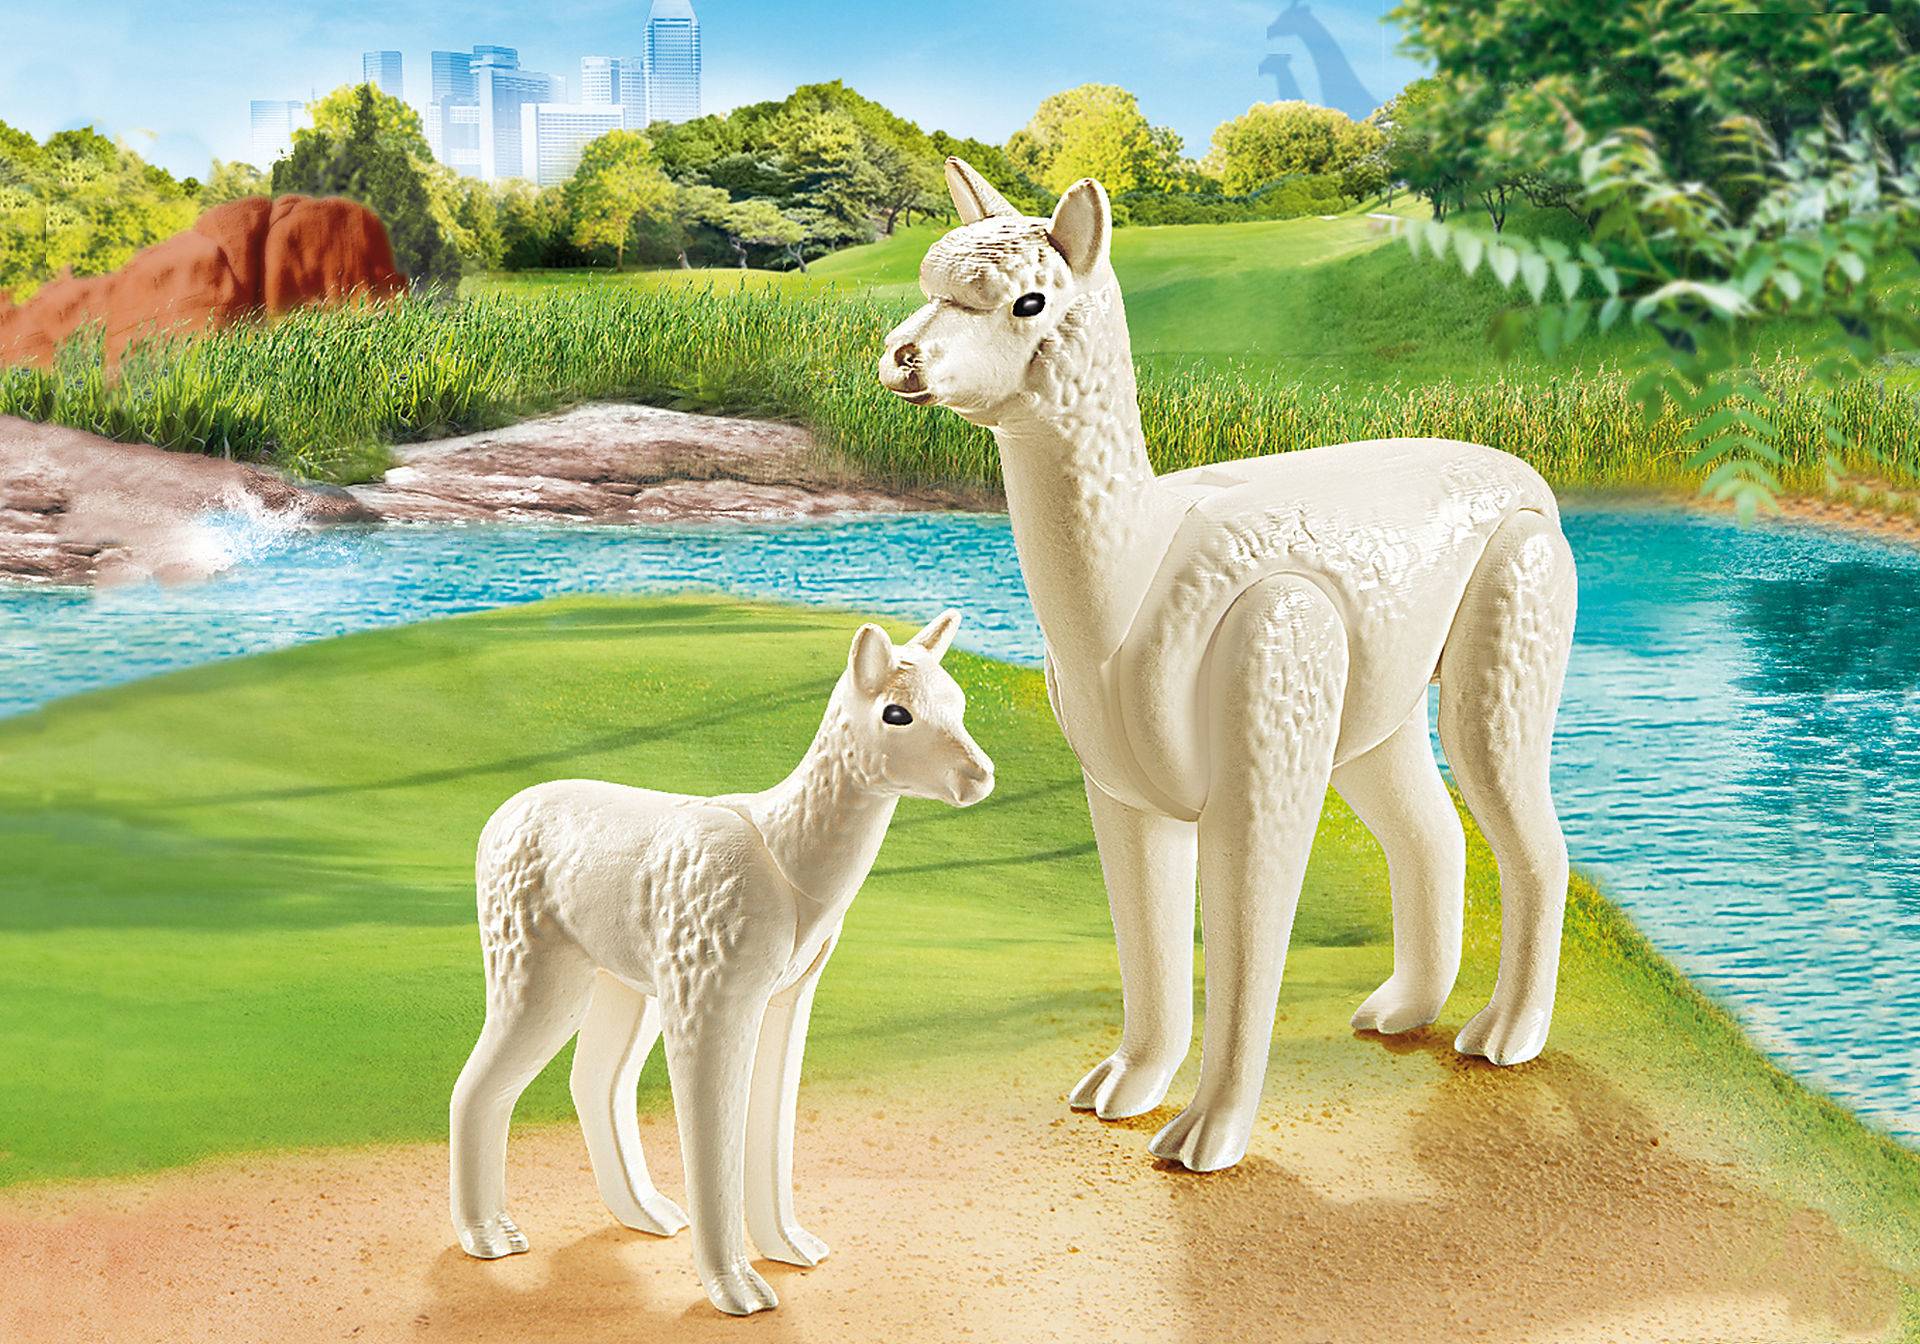 70350 Alpaca com bebé zoom image1